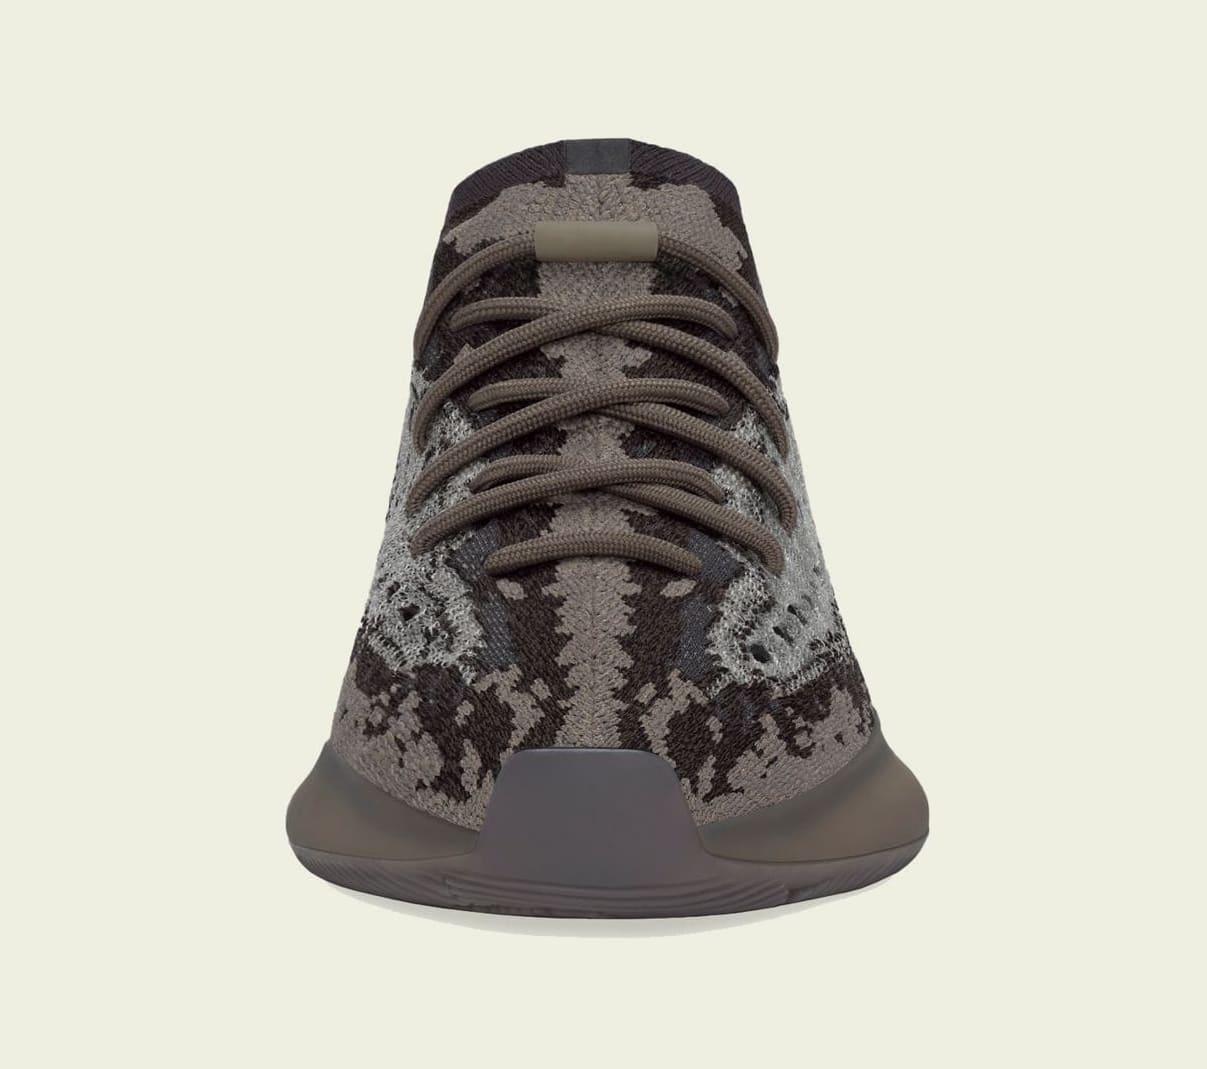 Adidas Yeezy Boost 380 'Stone Salt' GZ0472 Front